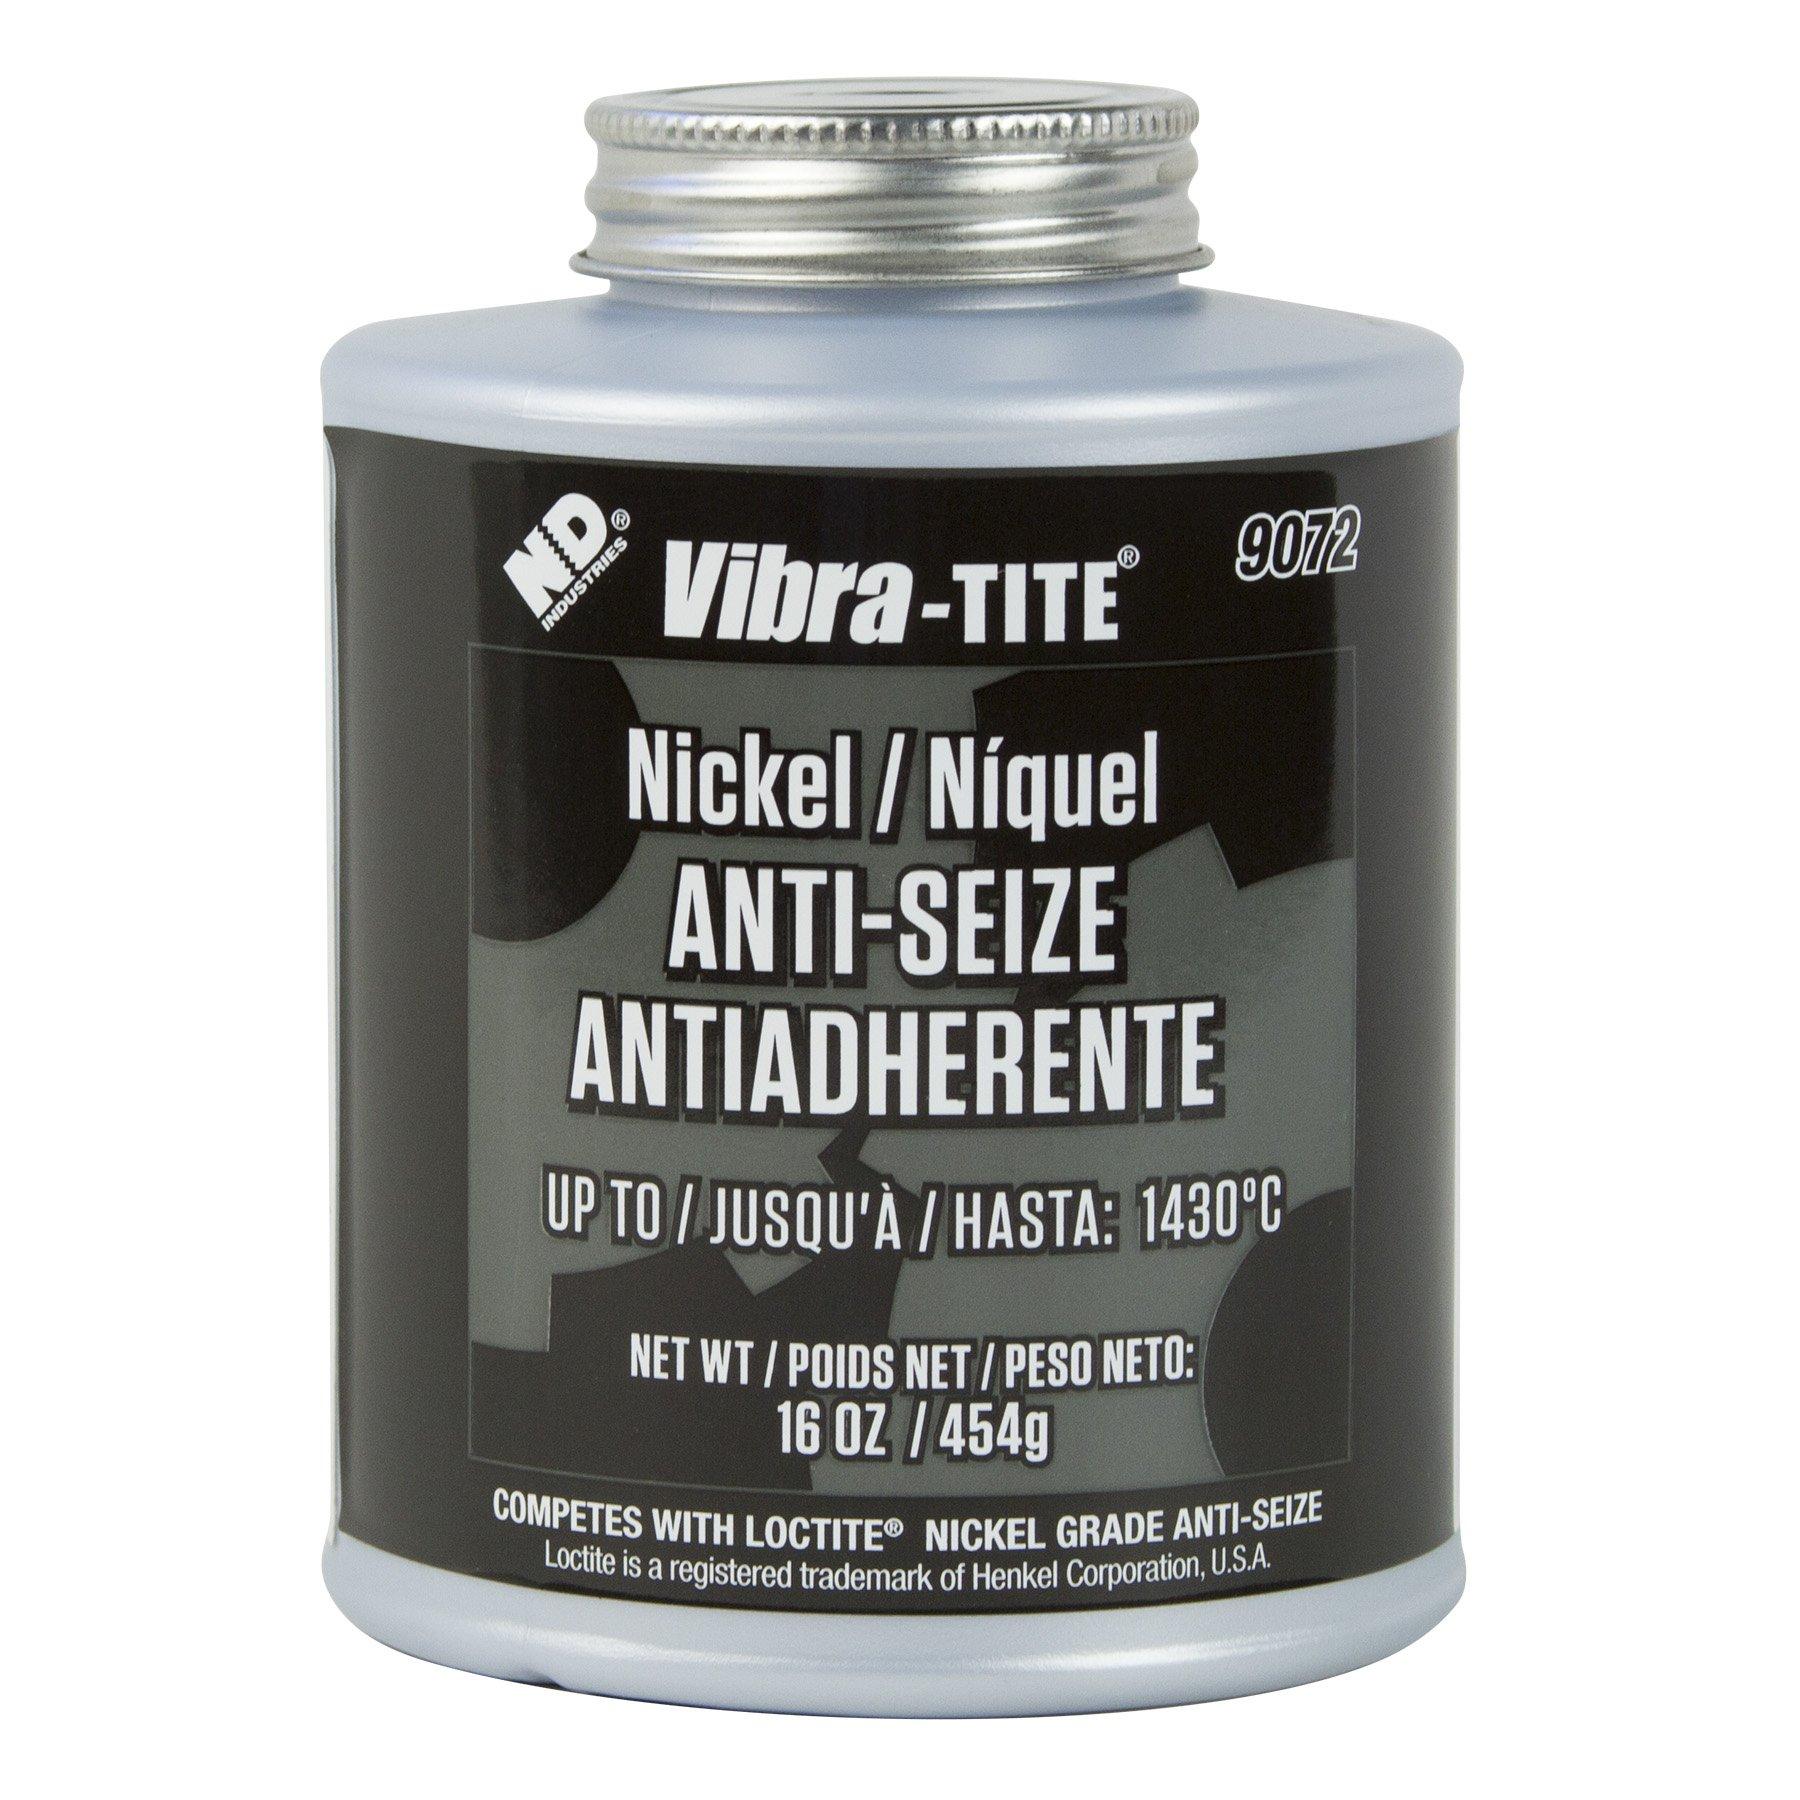 Vibra-TITE 90726 Nickel Anti-Seize Lubricant Compound, 16 oz Jar with Brush